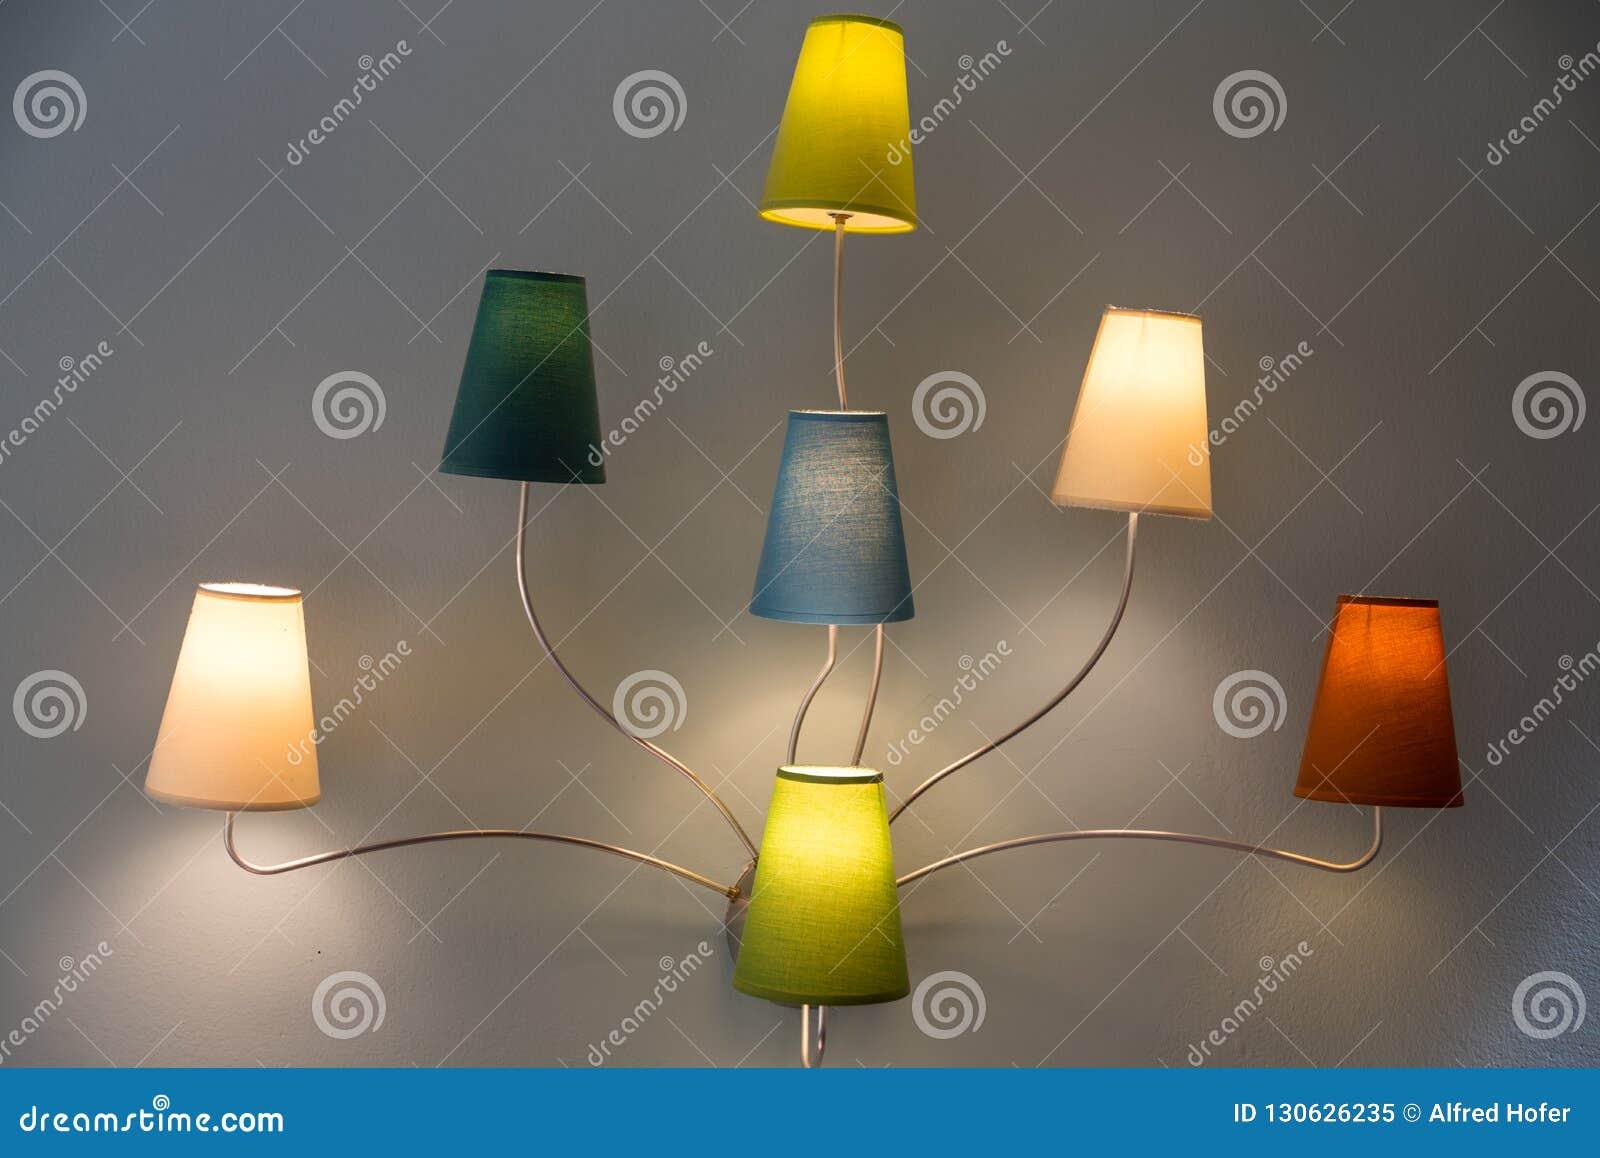 Luzes interiores coloridas - lâmpadas